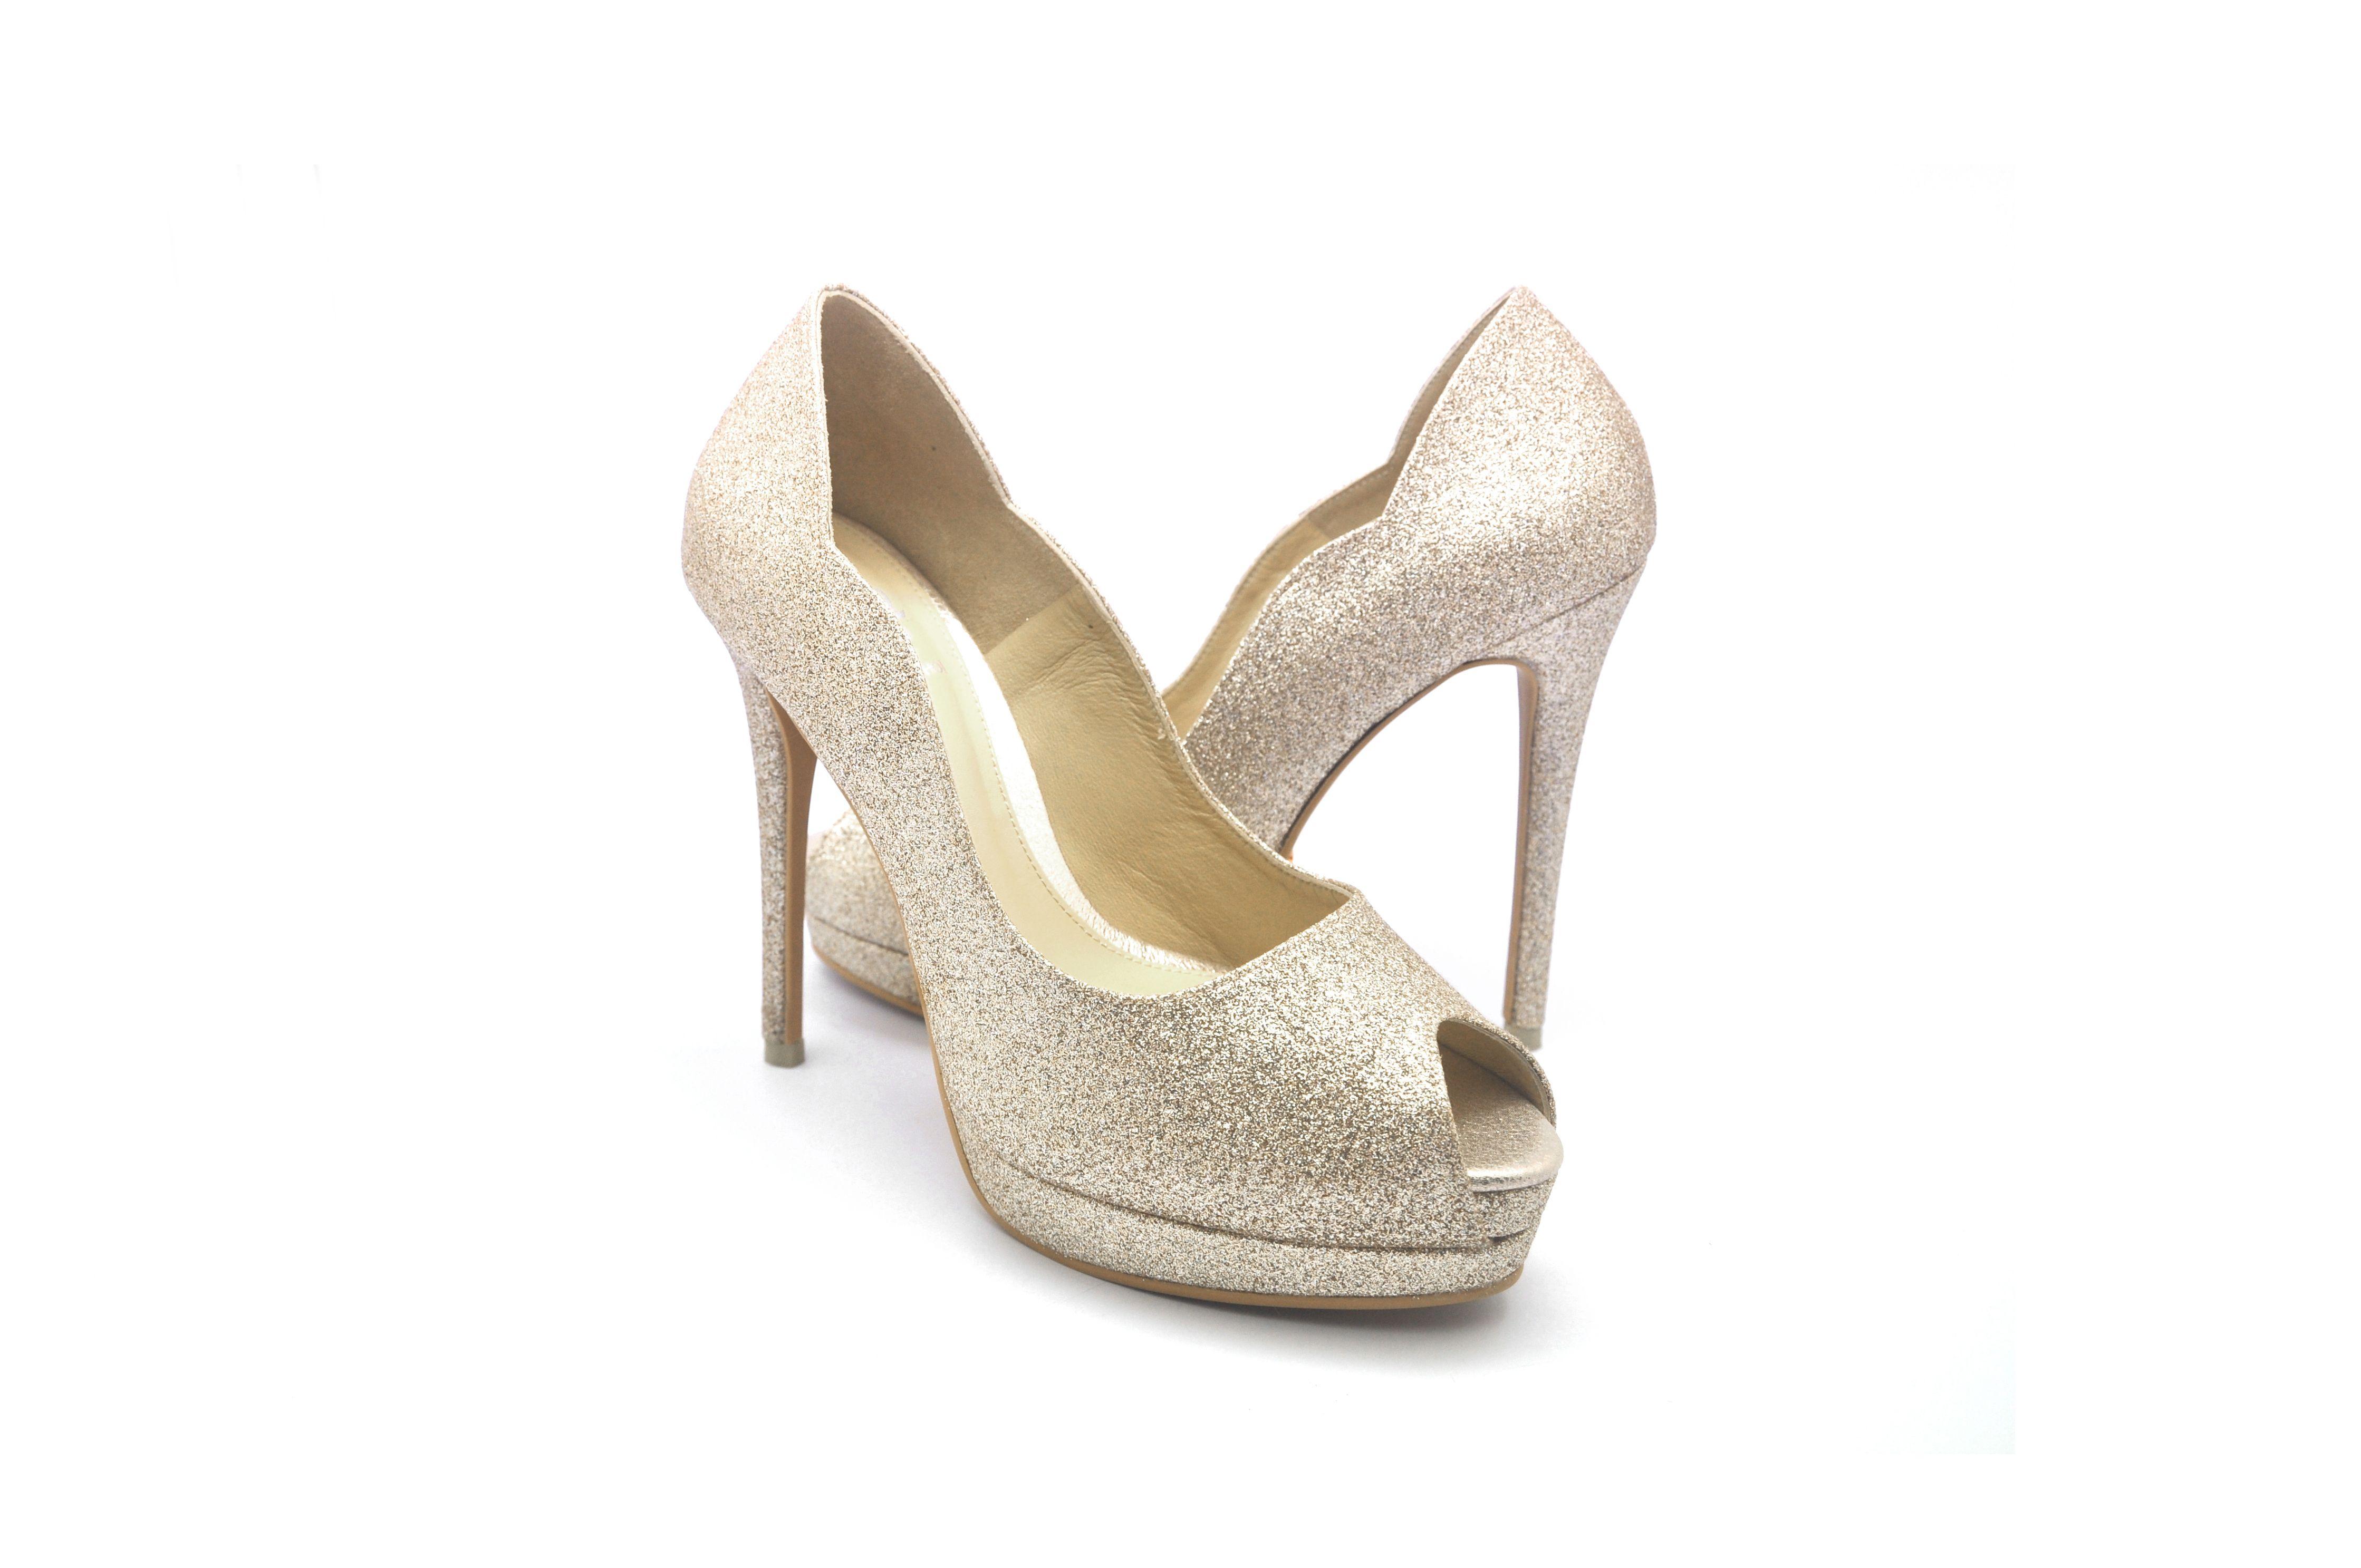 Celest Thoi Bespoke Bridal Heels Classic Peek Toes With Glitters